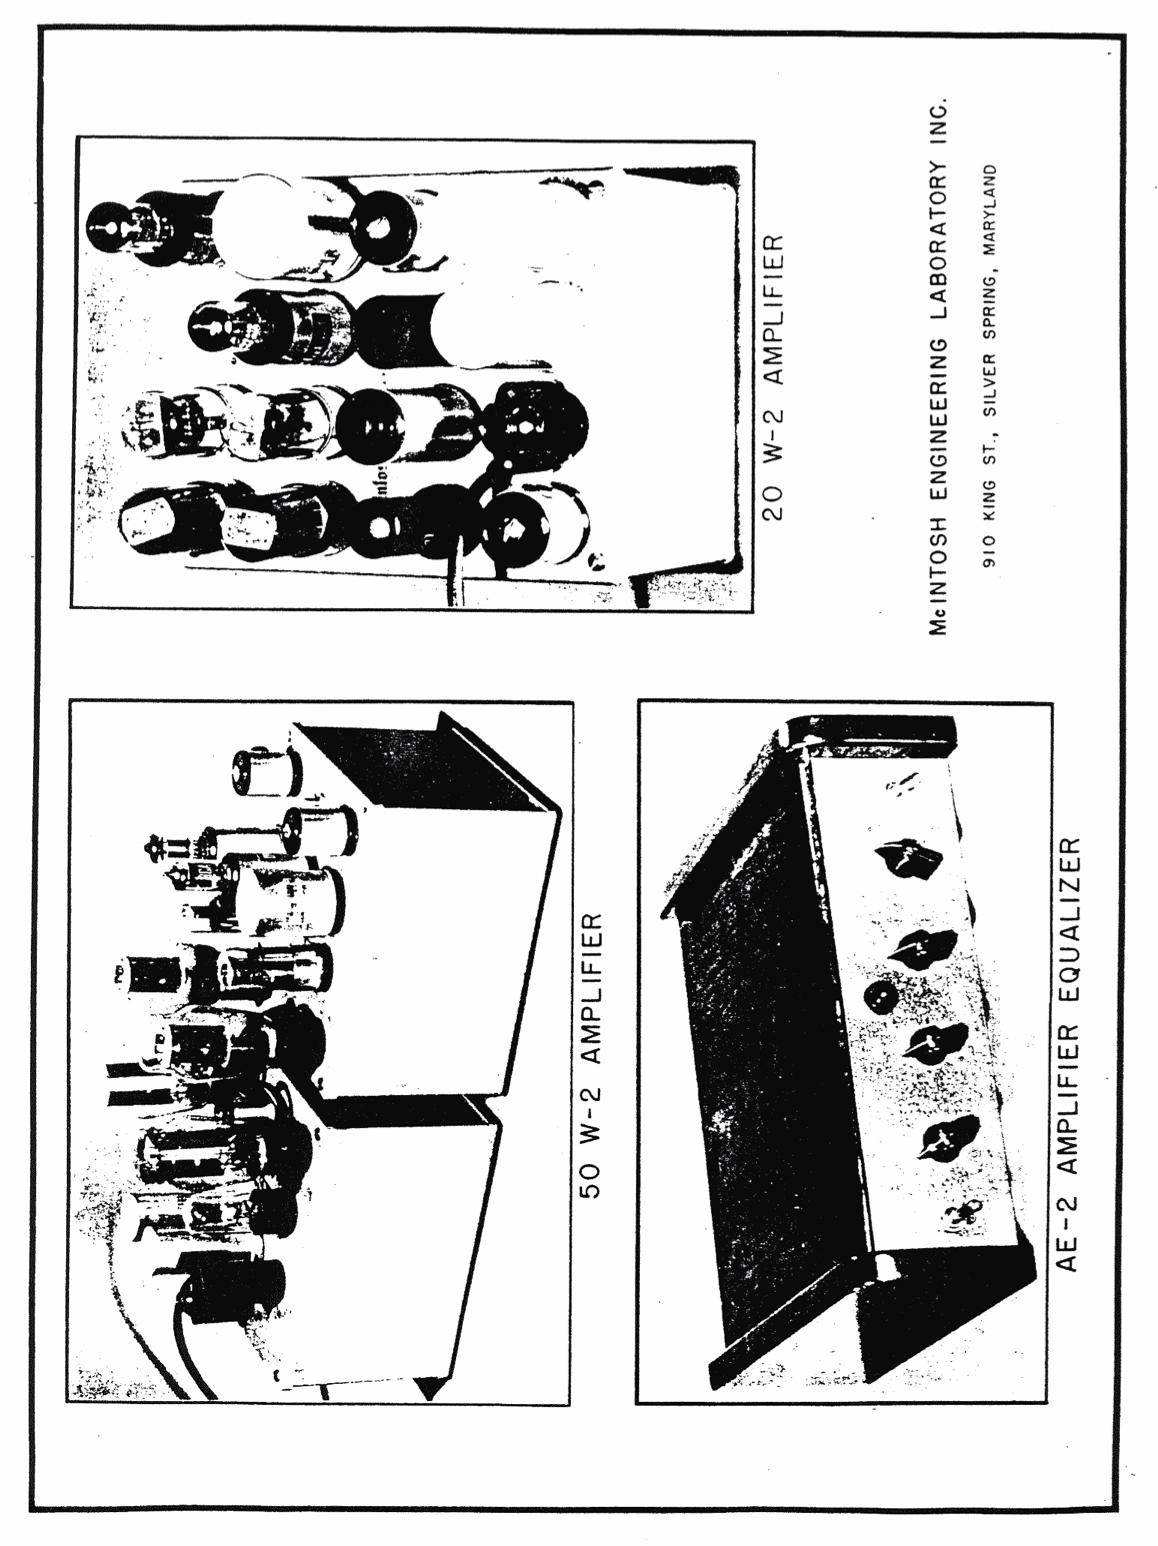 Retro Vintage Modern Hi Fi Mcintosh New 50 Watt Amplifier